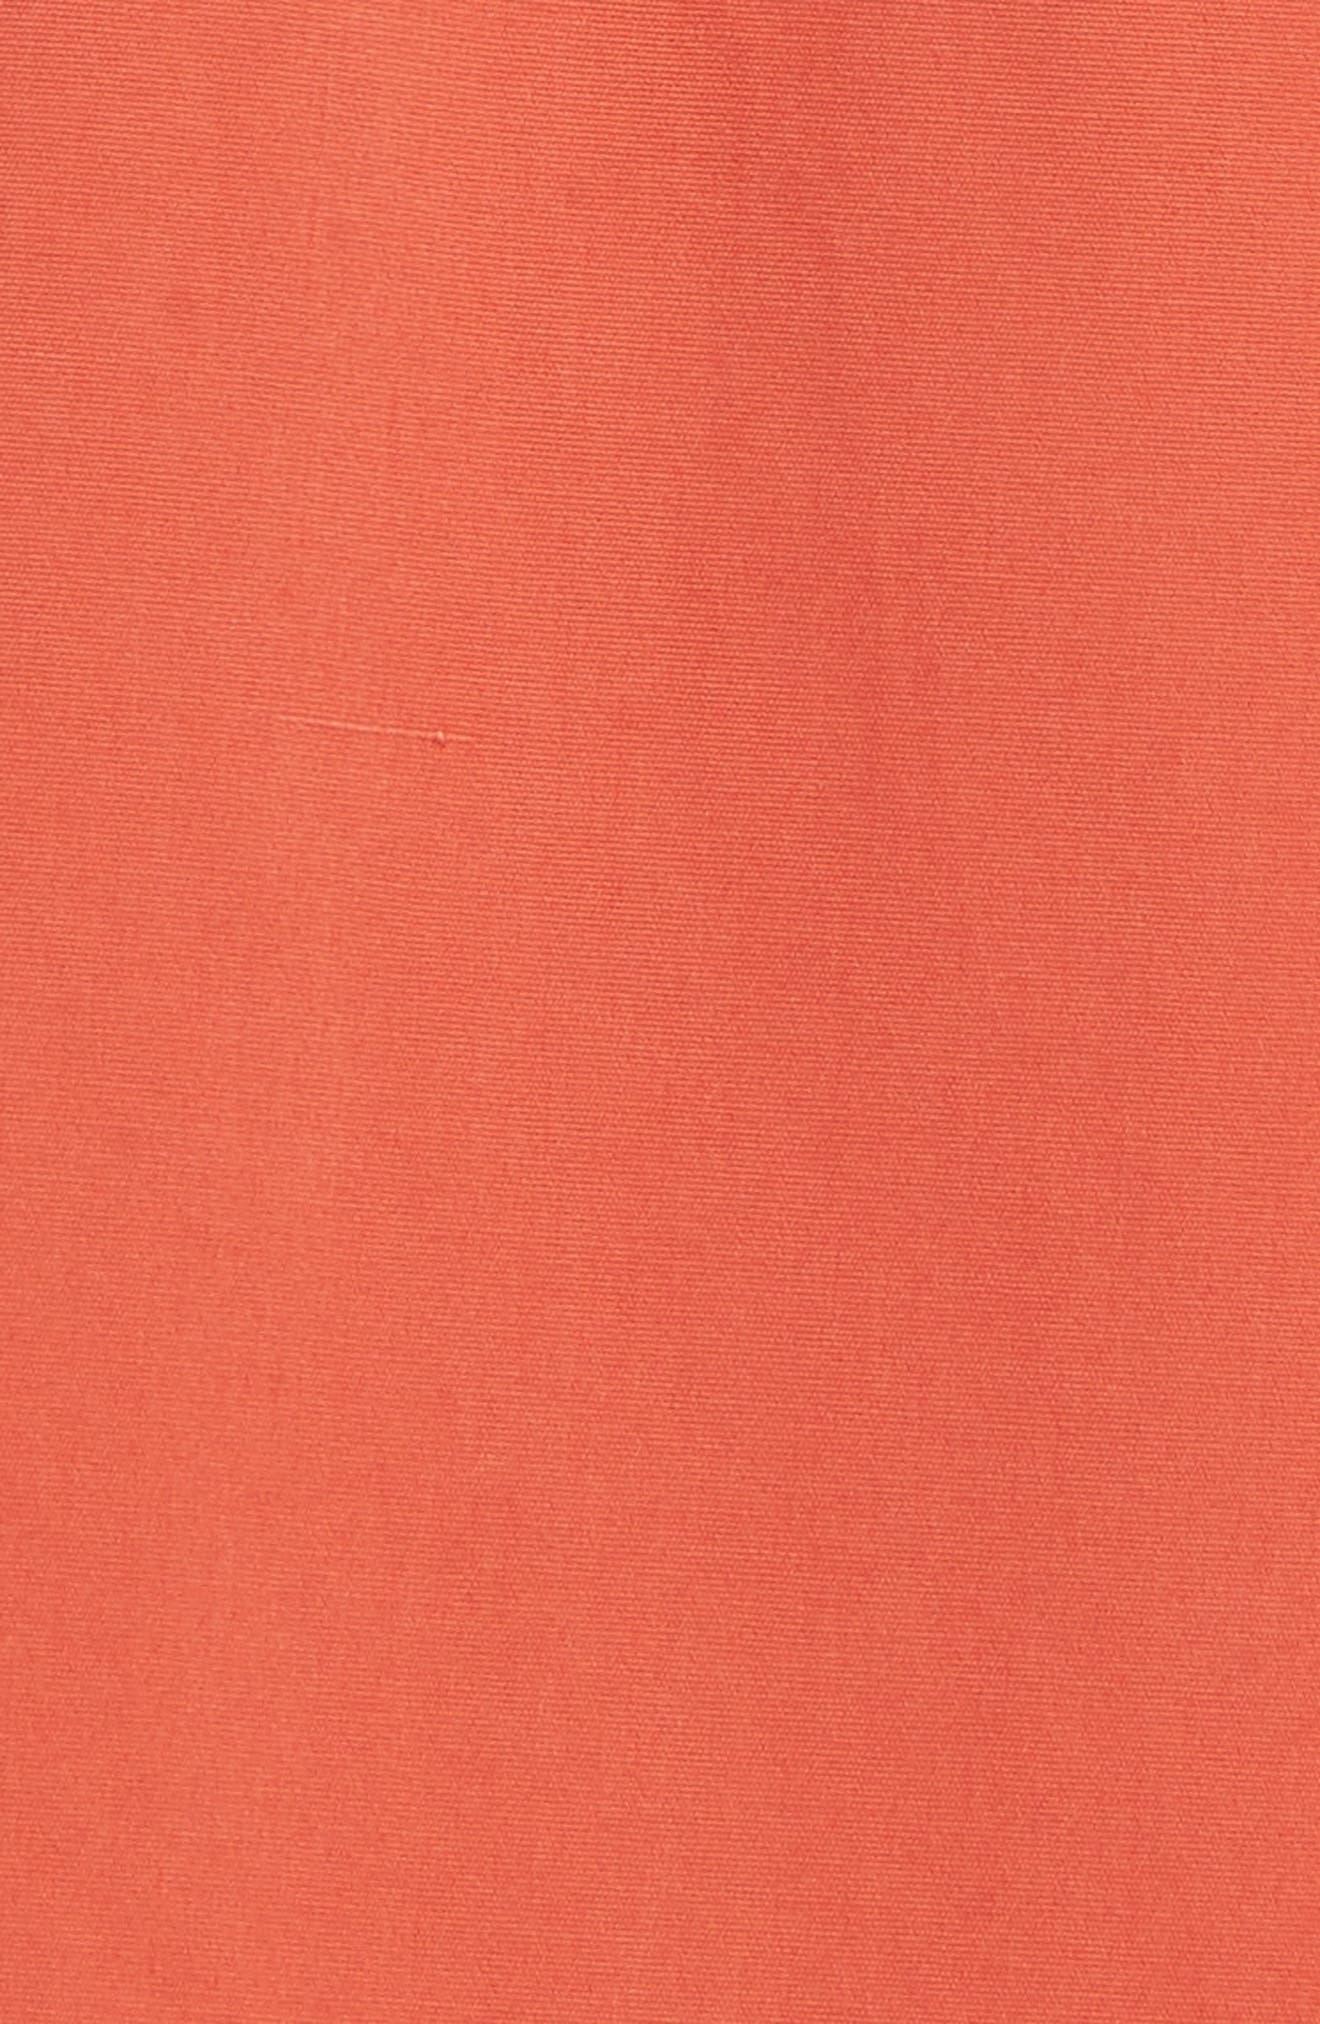 Cotton Poplin Shirtdress,                             Alternate thumbnail 5, color,